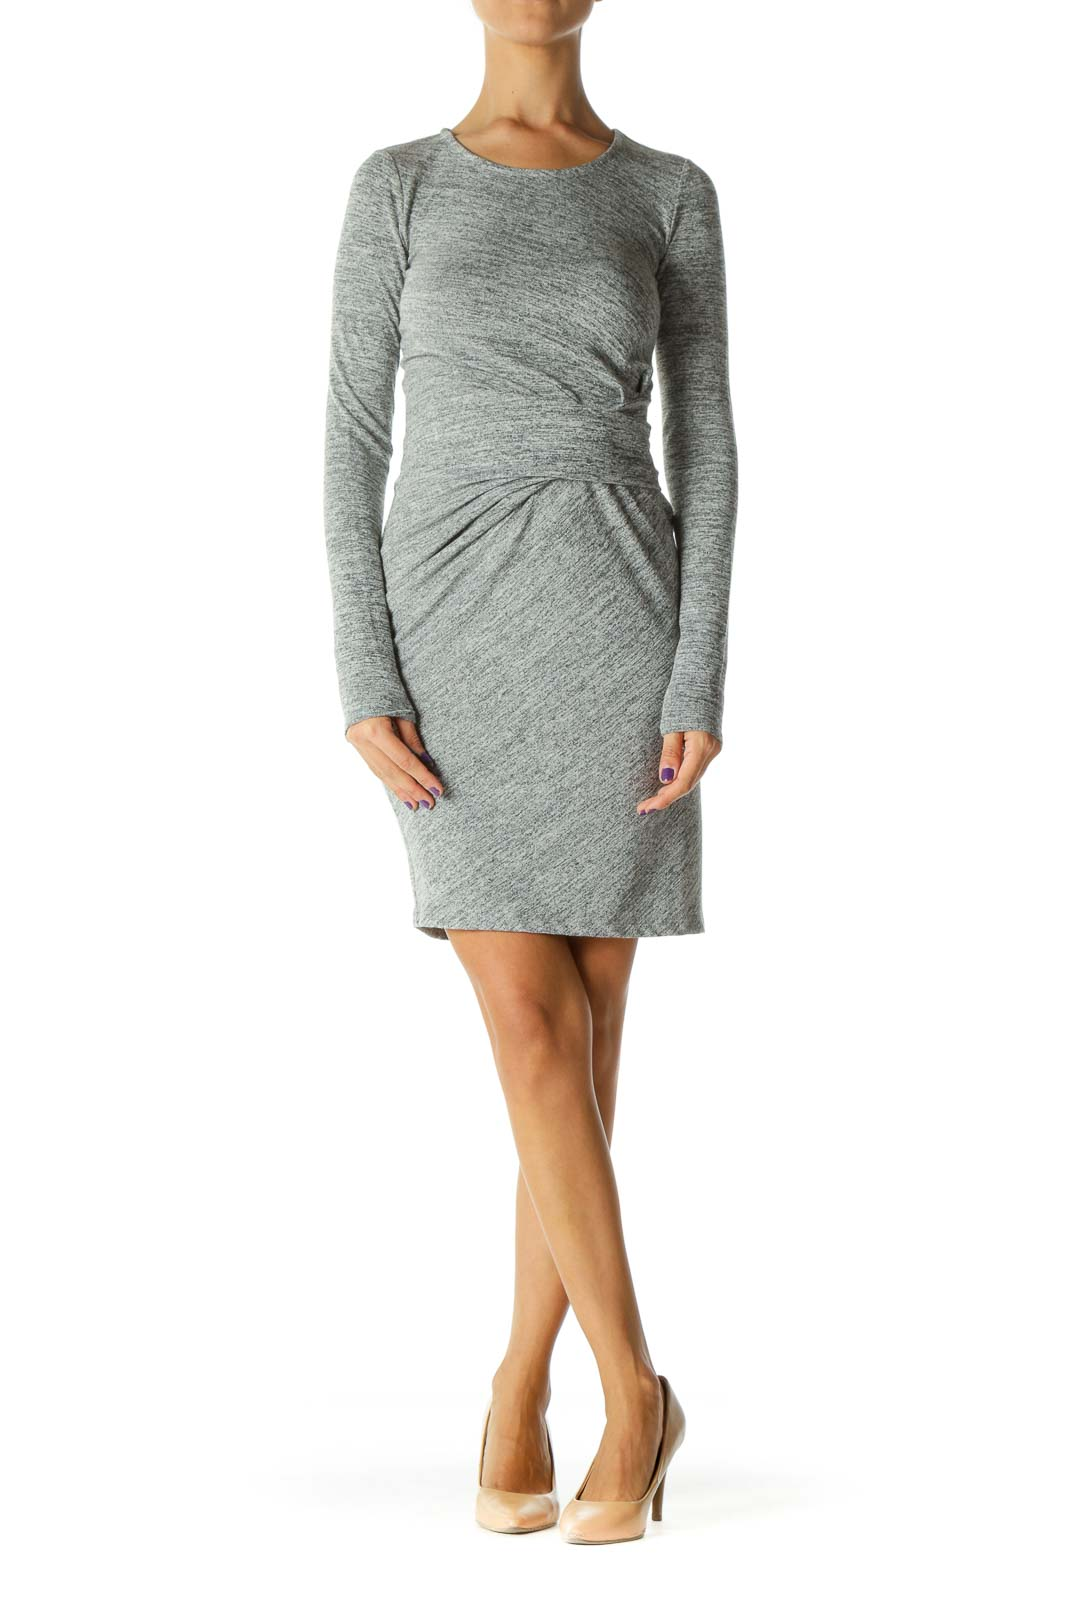 Gray Long Sleeve Knit Dress